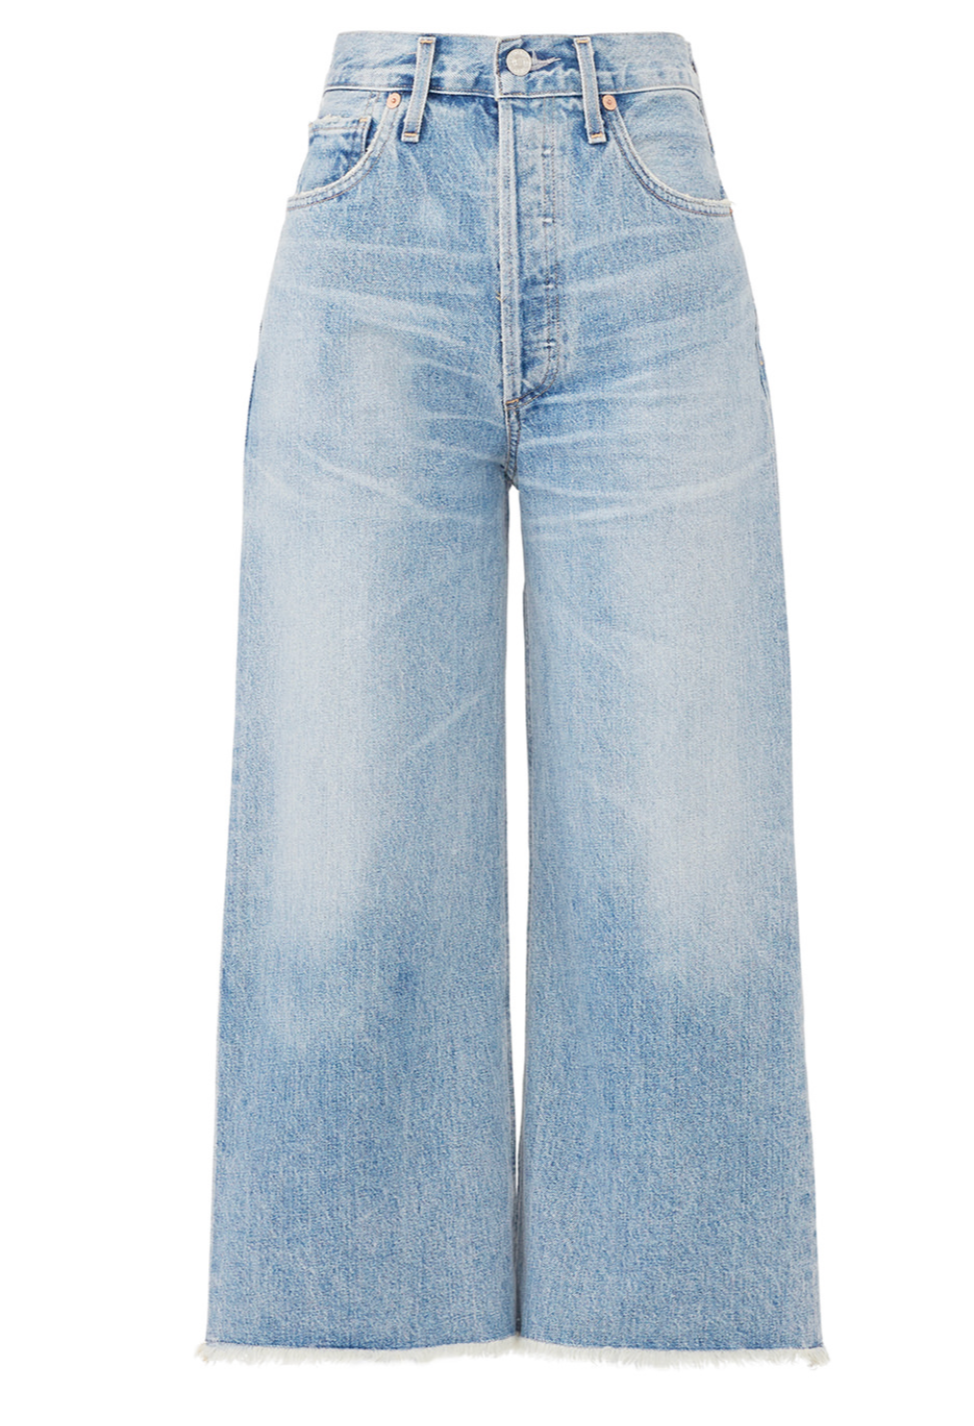 https://www.renttherunway.com/shop/designers/citizens_of_humanity/emma_wide_leg_crop_jeans